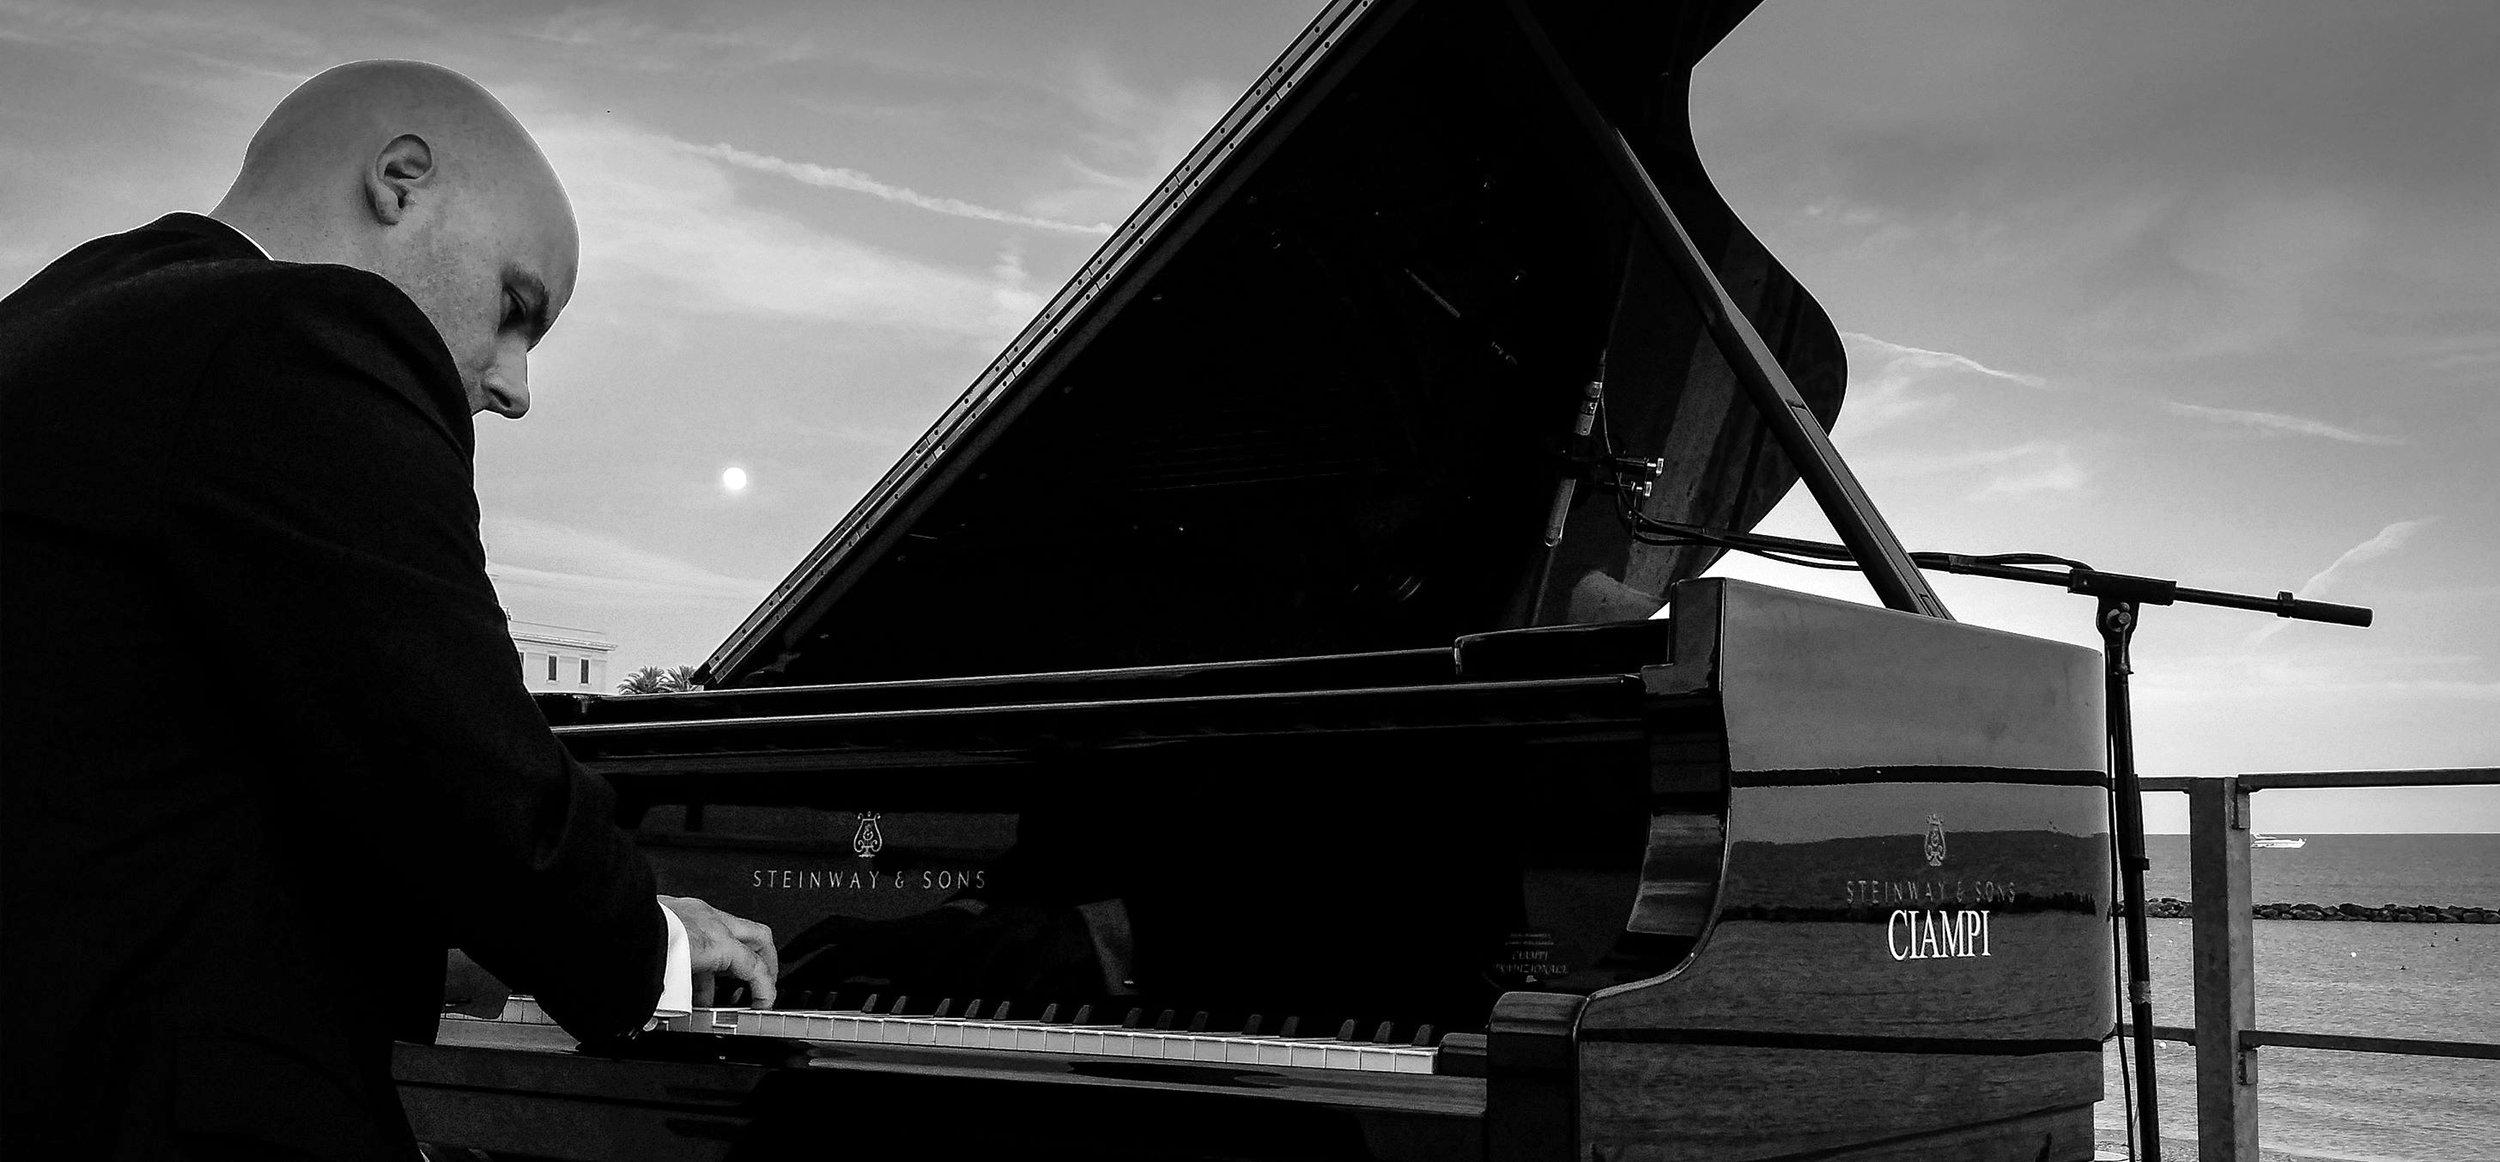 Simone concerto pianoforte.jpg